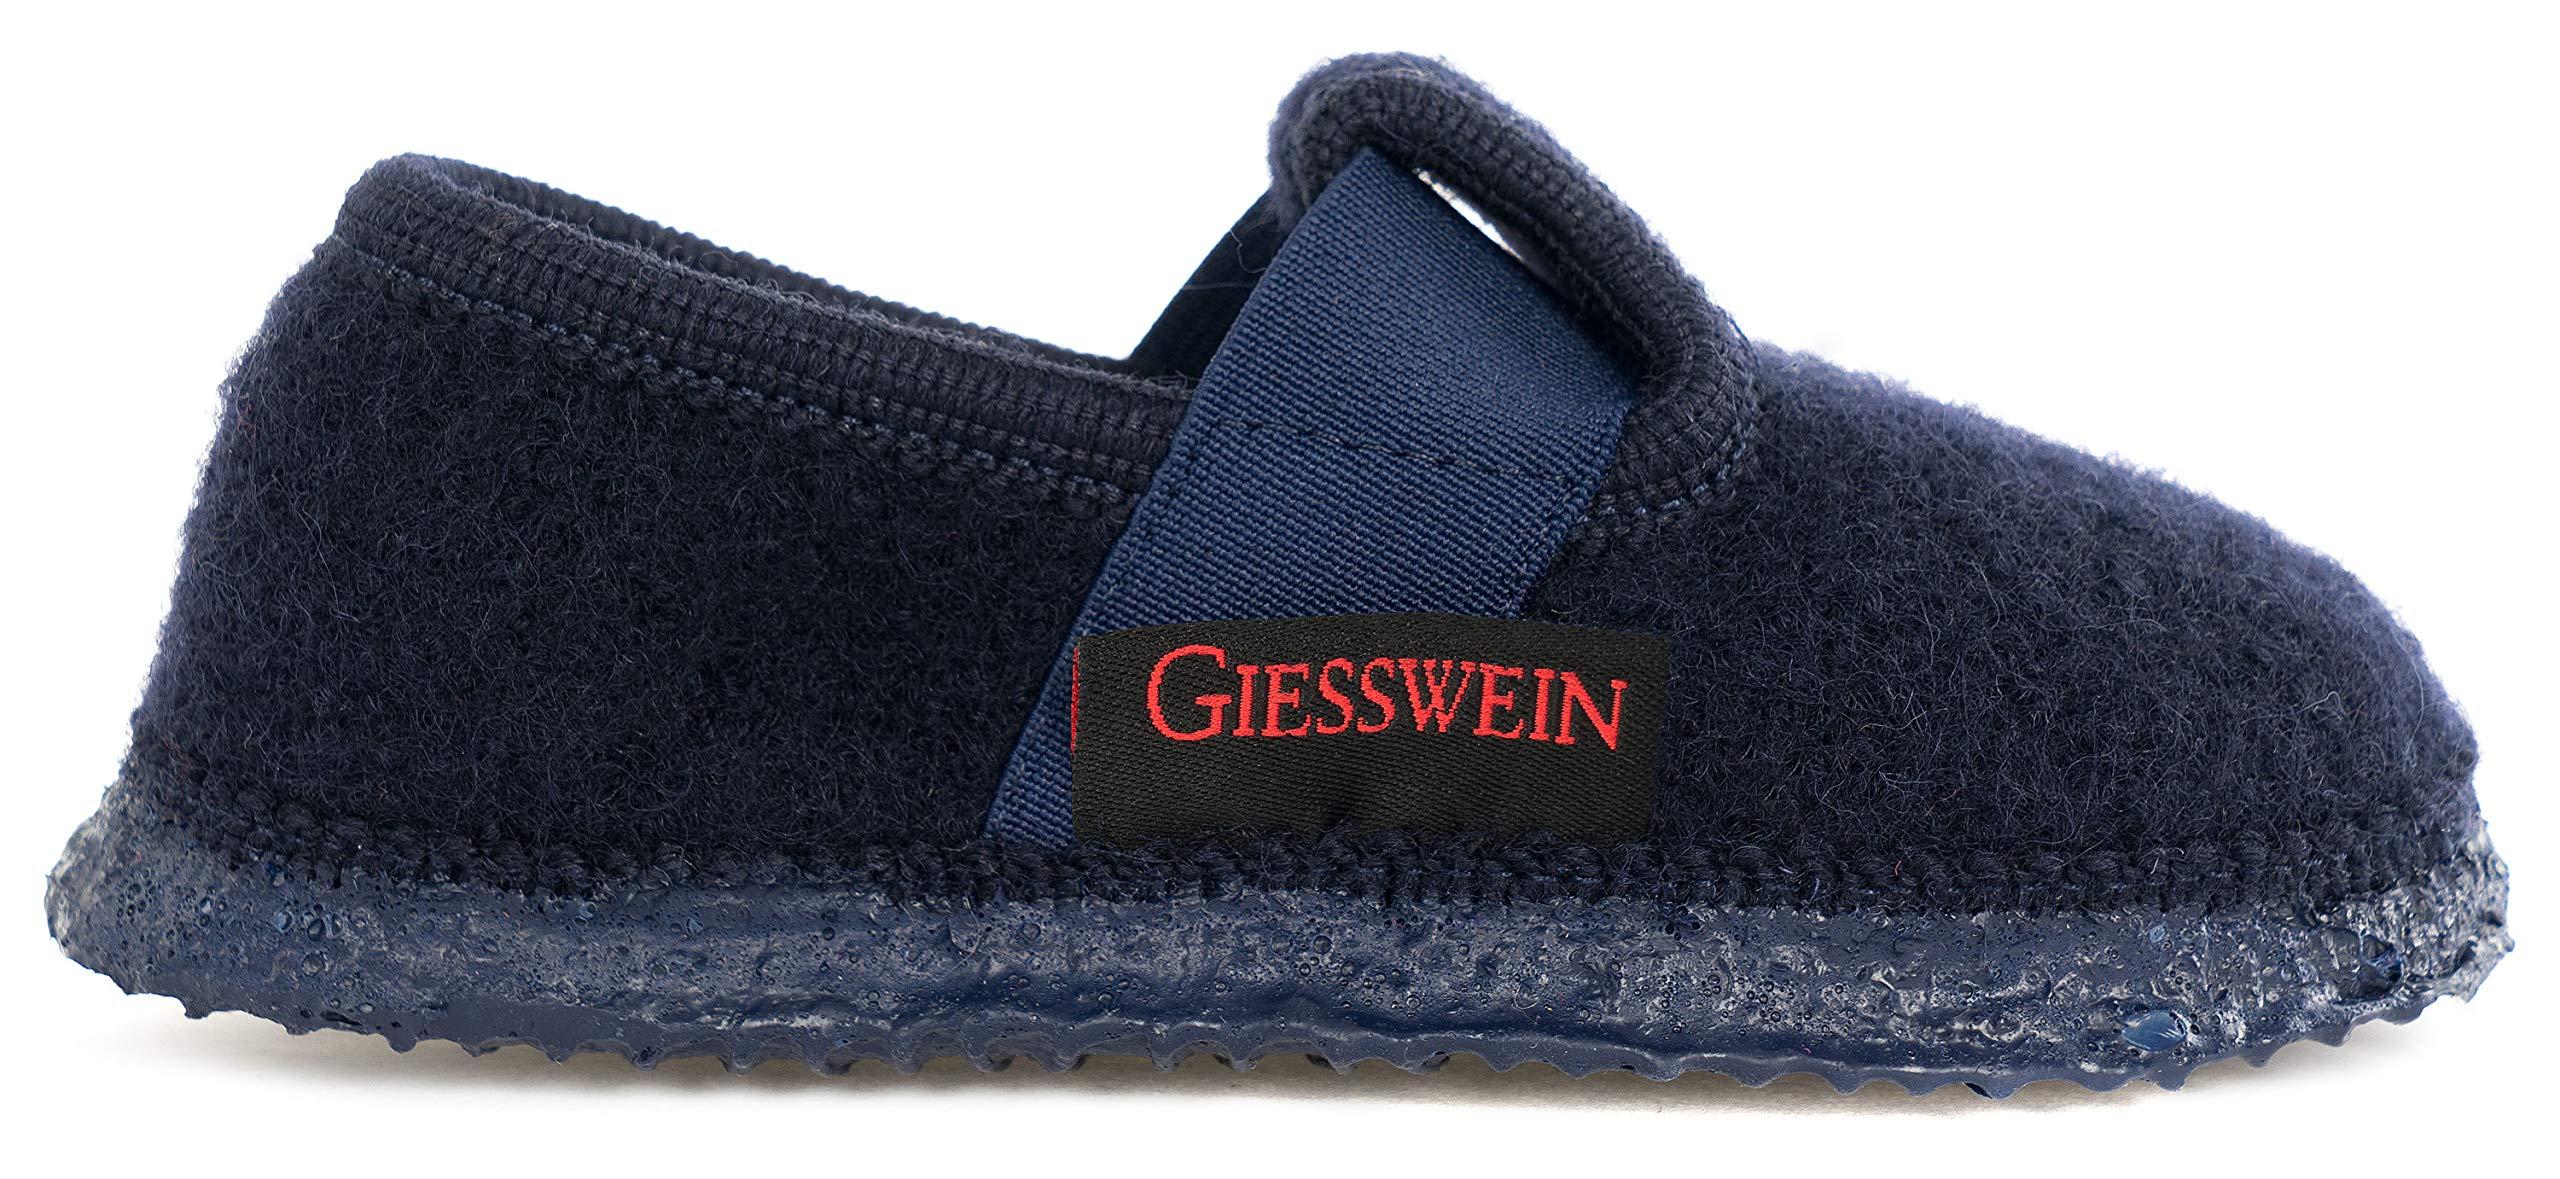 Giesswein Slipper Türnberg by Giesswein (Image #5)